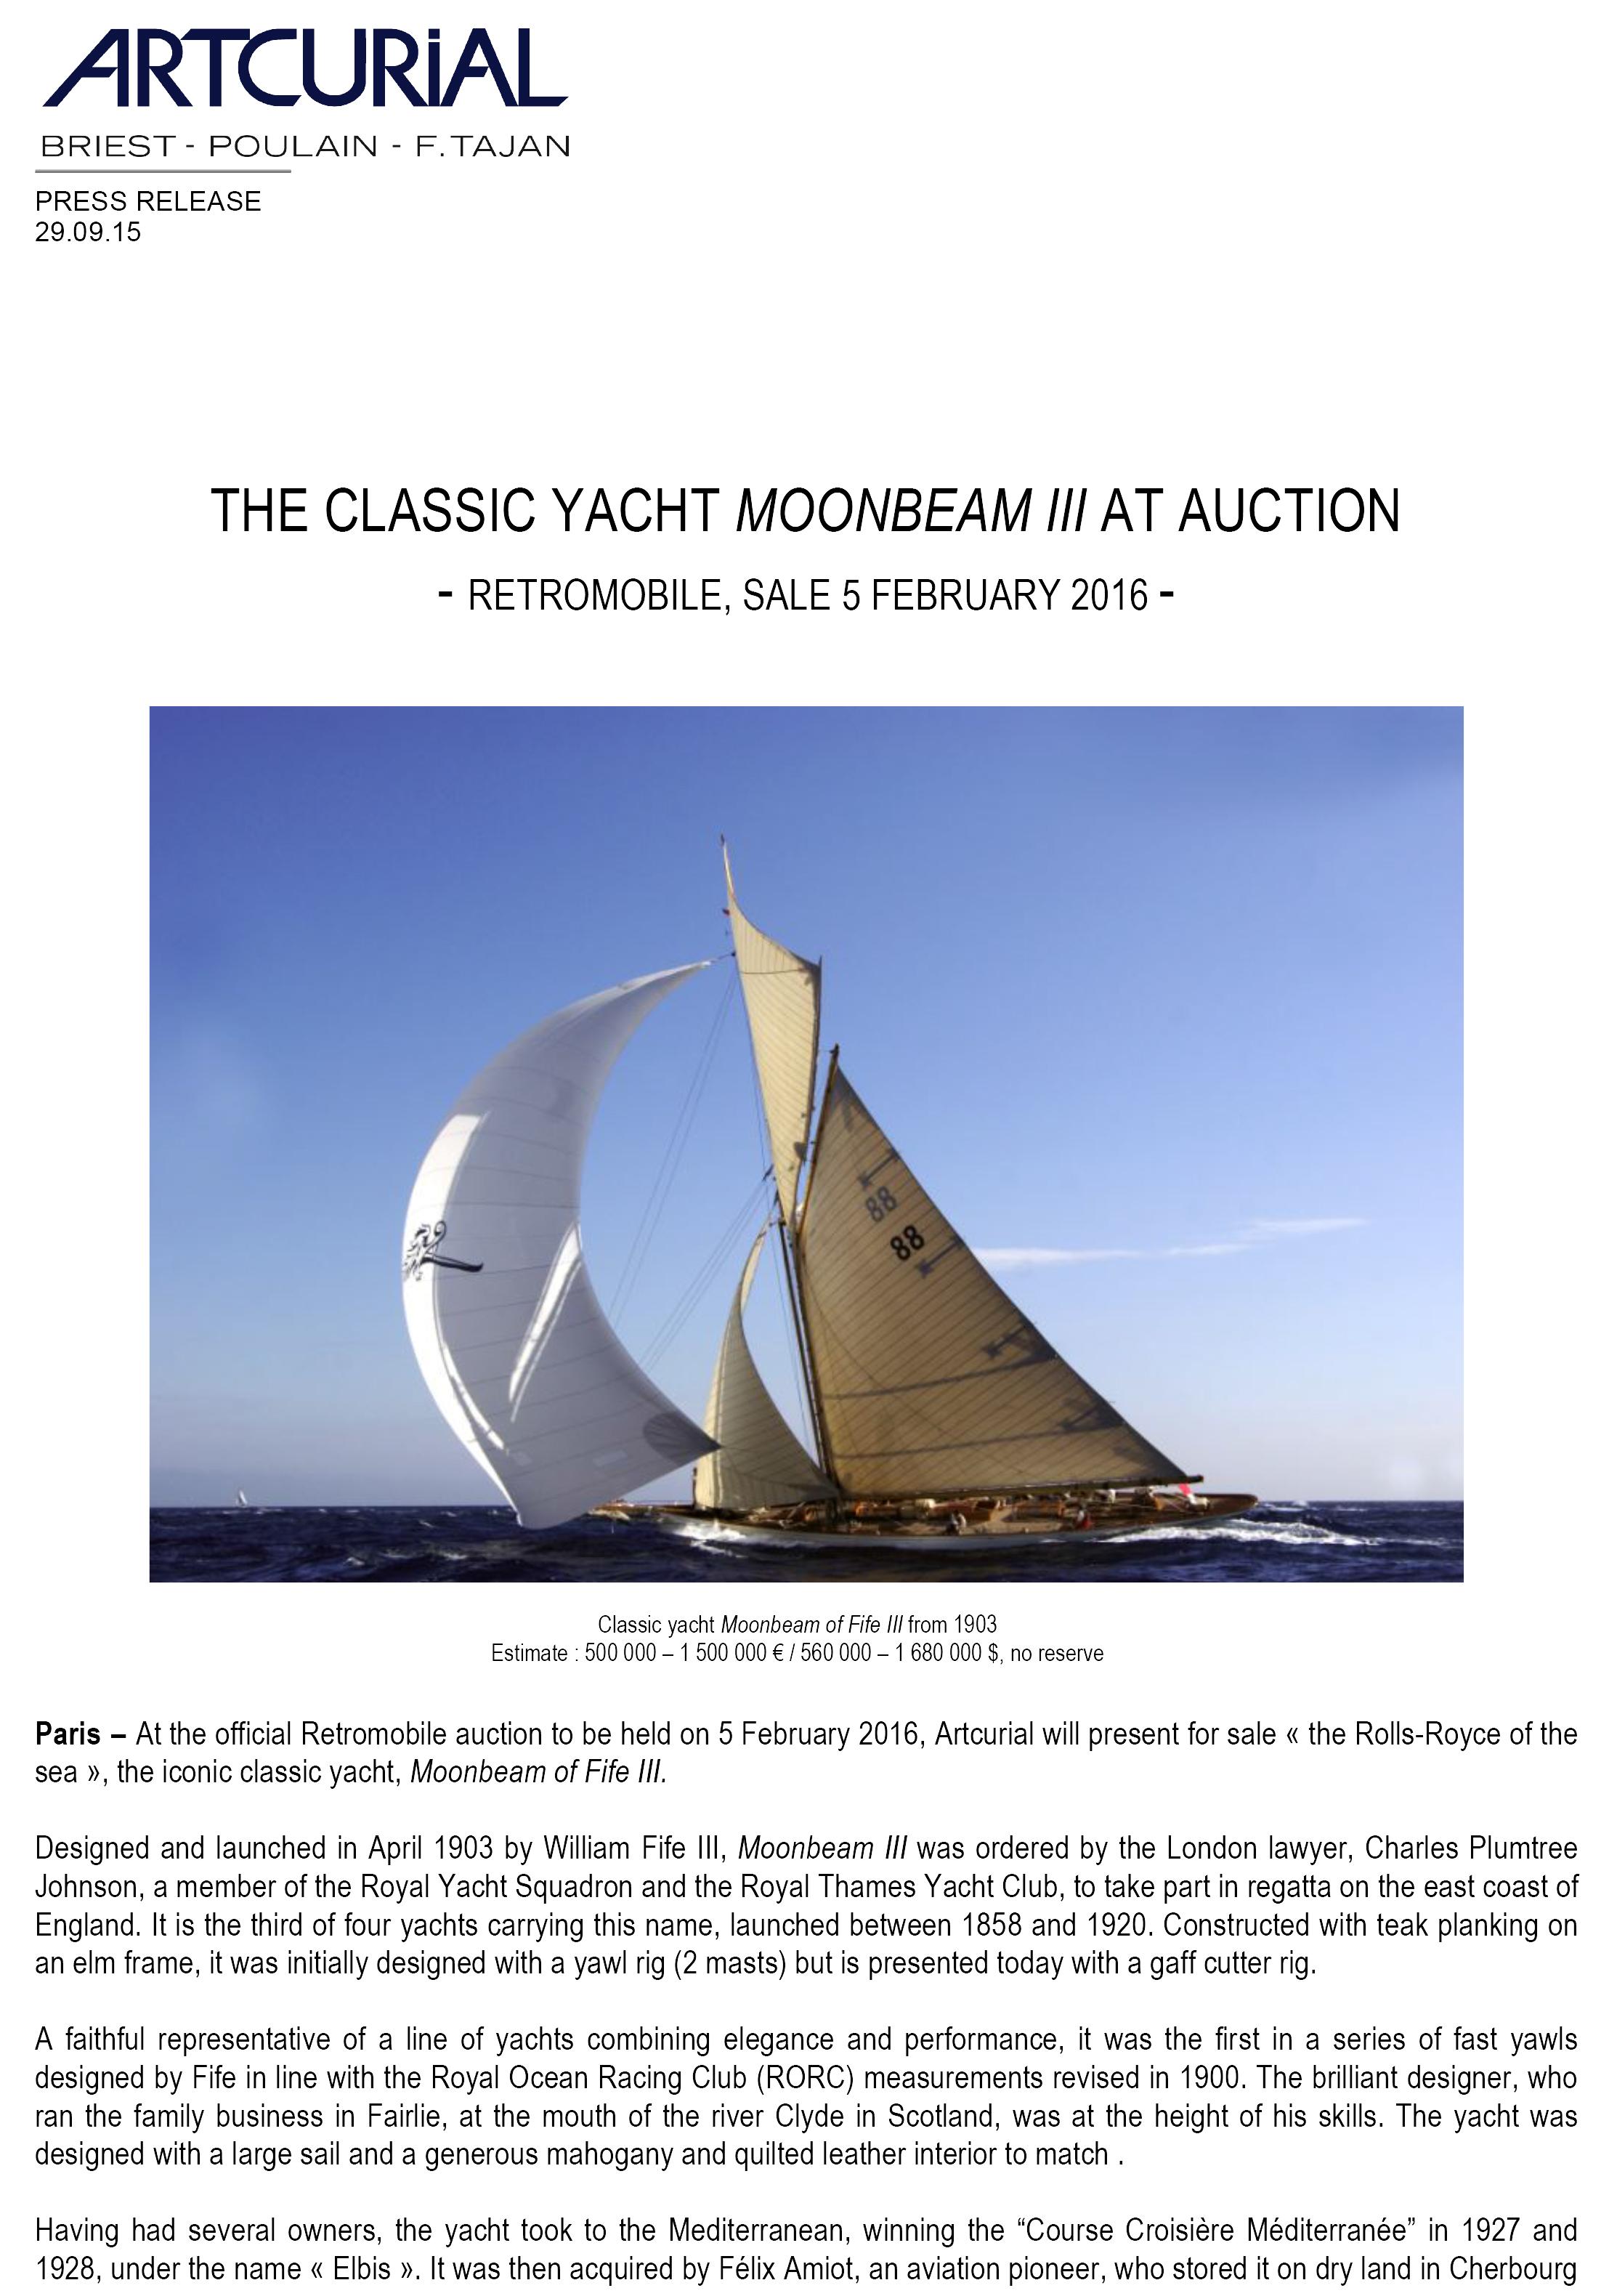 AuctionMoonbeamIII_image1